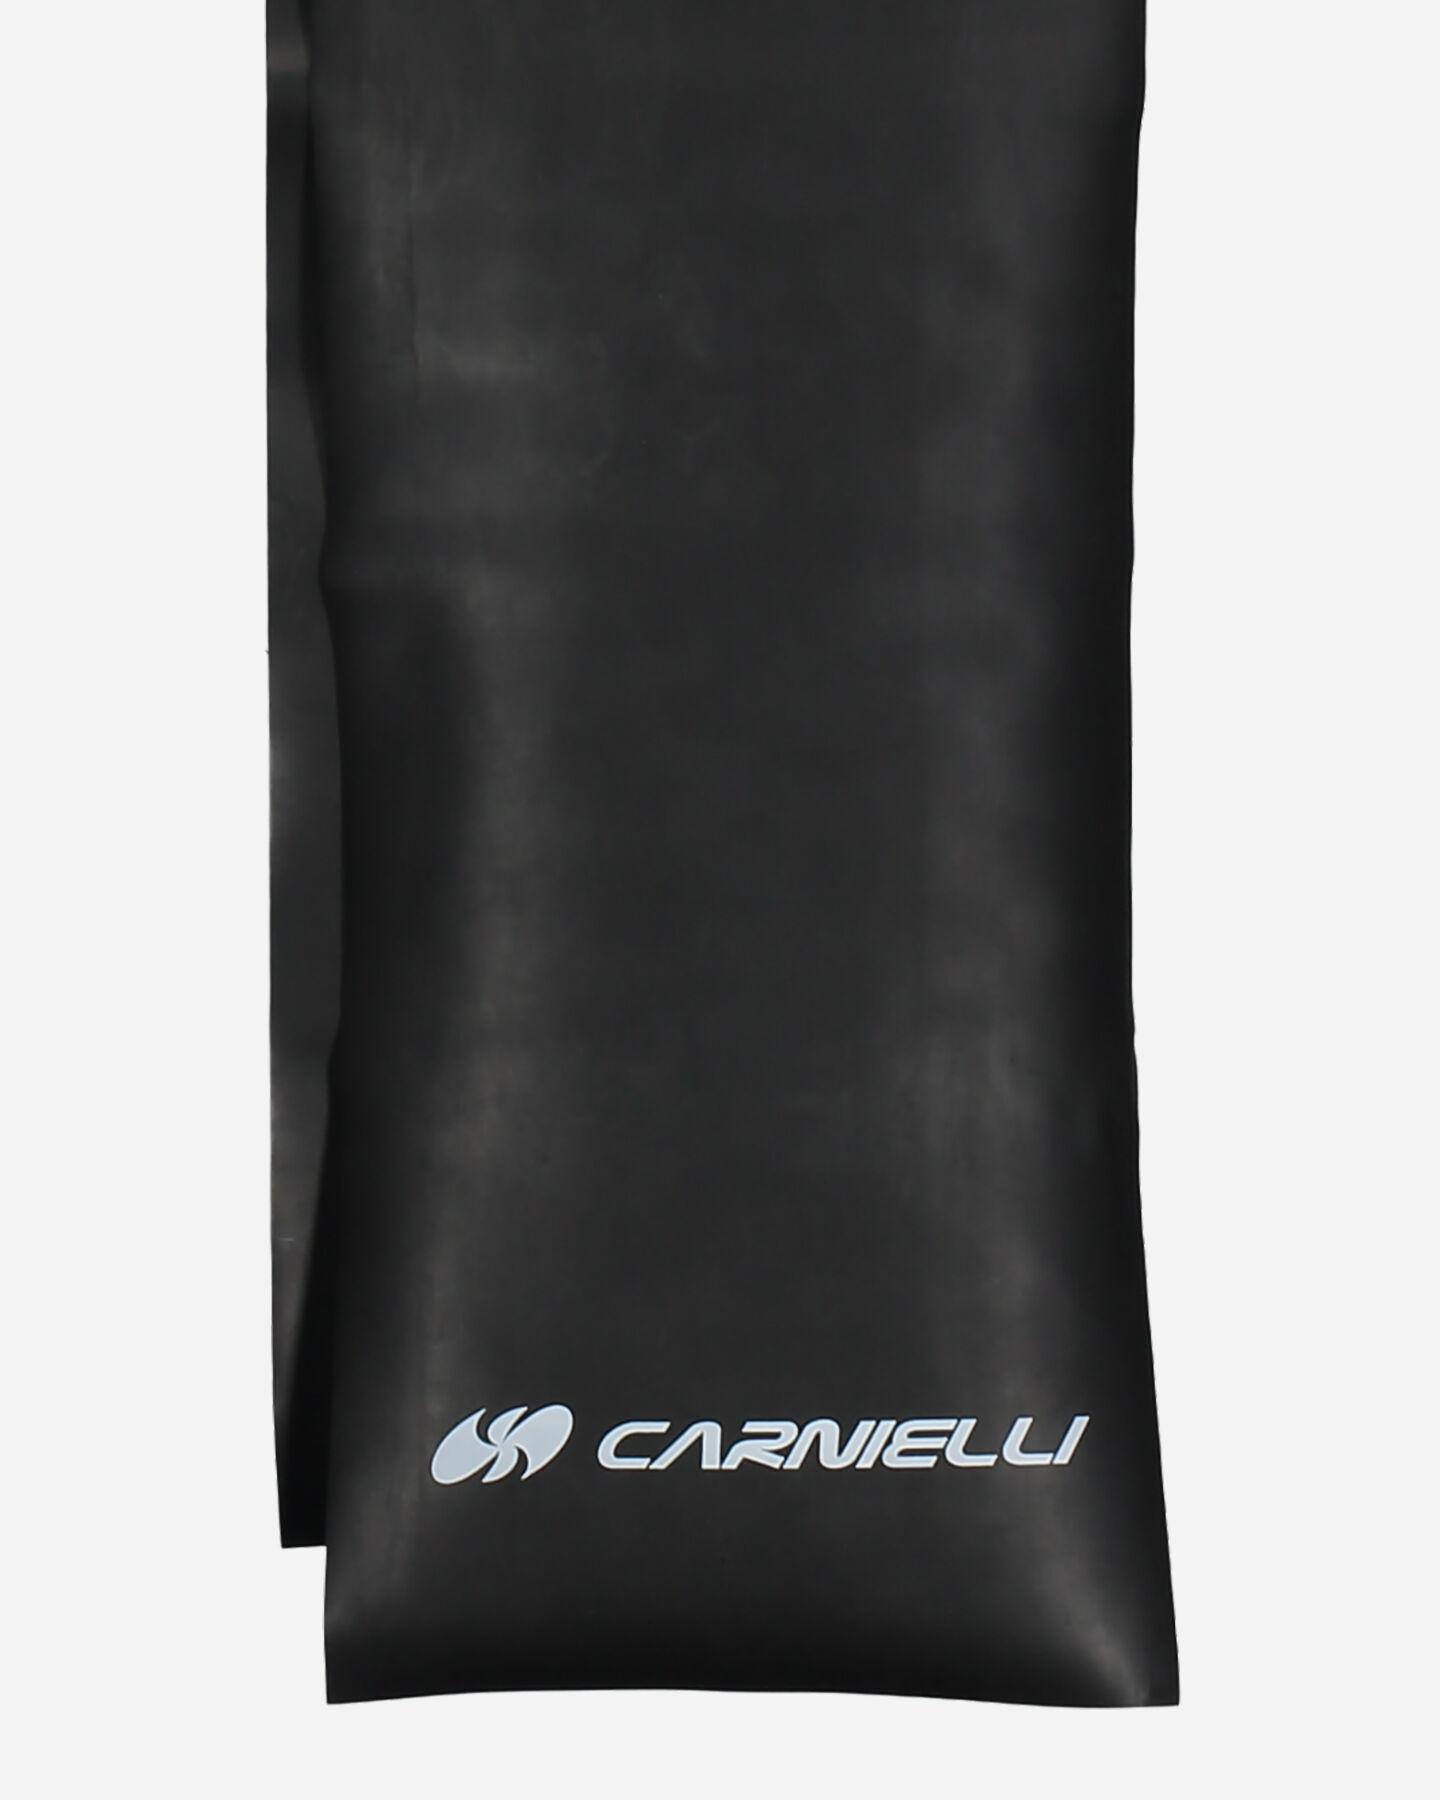 Banda elastica CARNIELLI BANDA ELASTICA 175 CM S1326889 1 UNI scatto 1